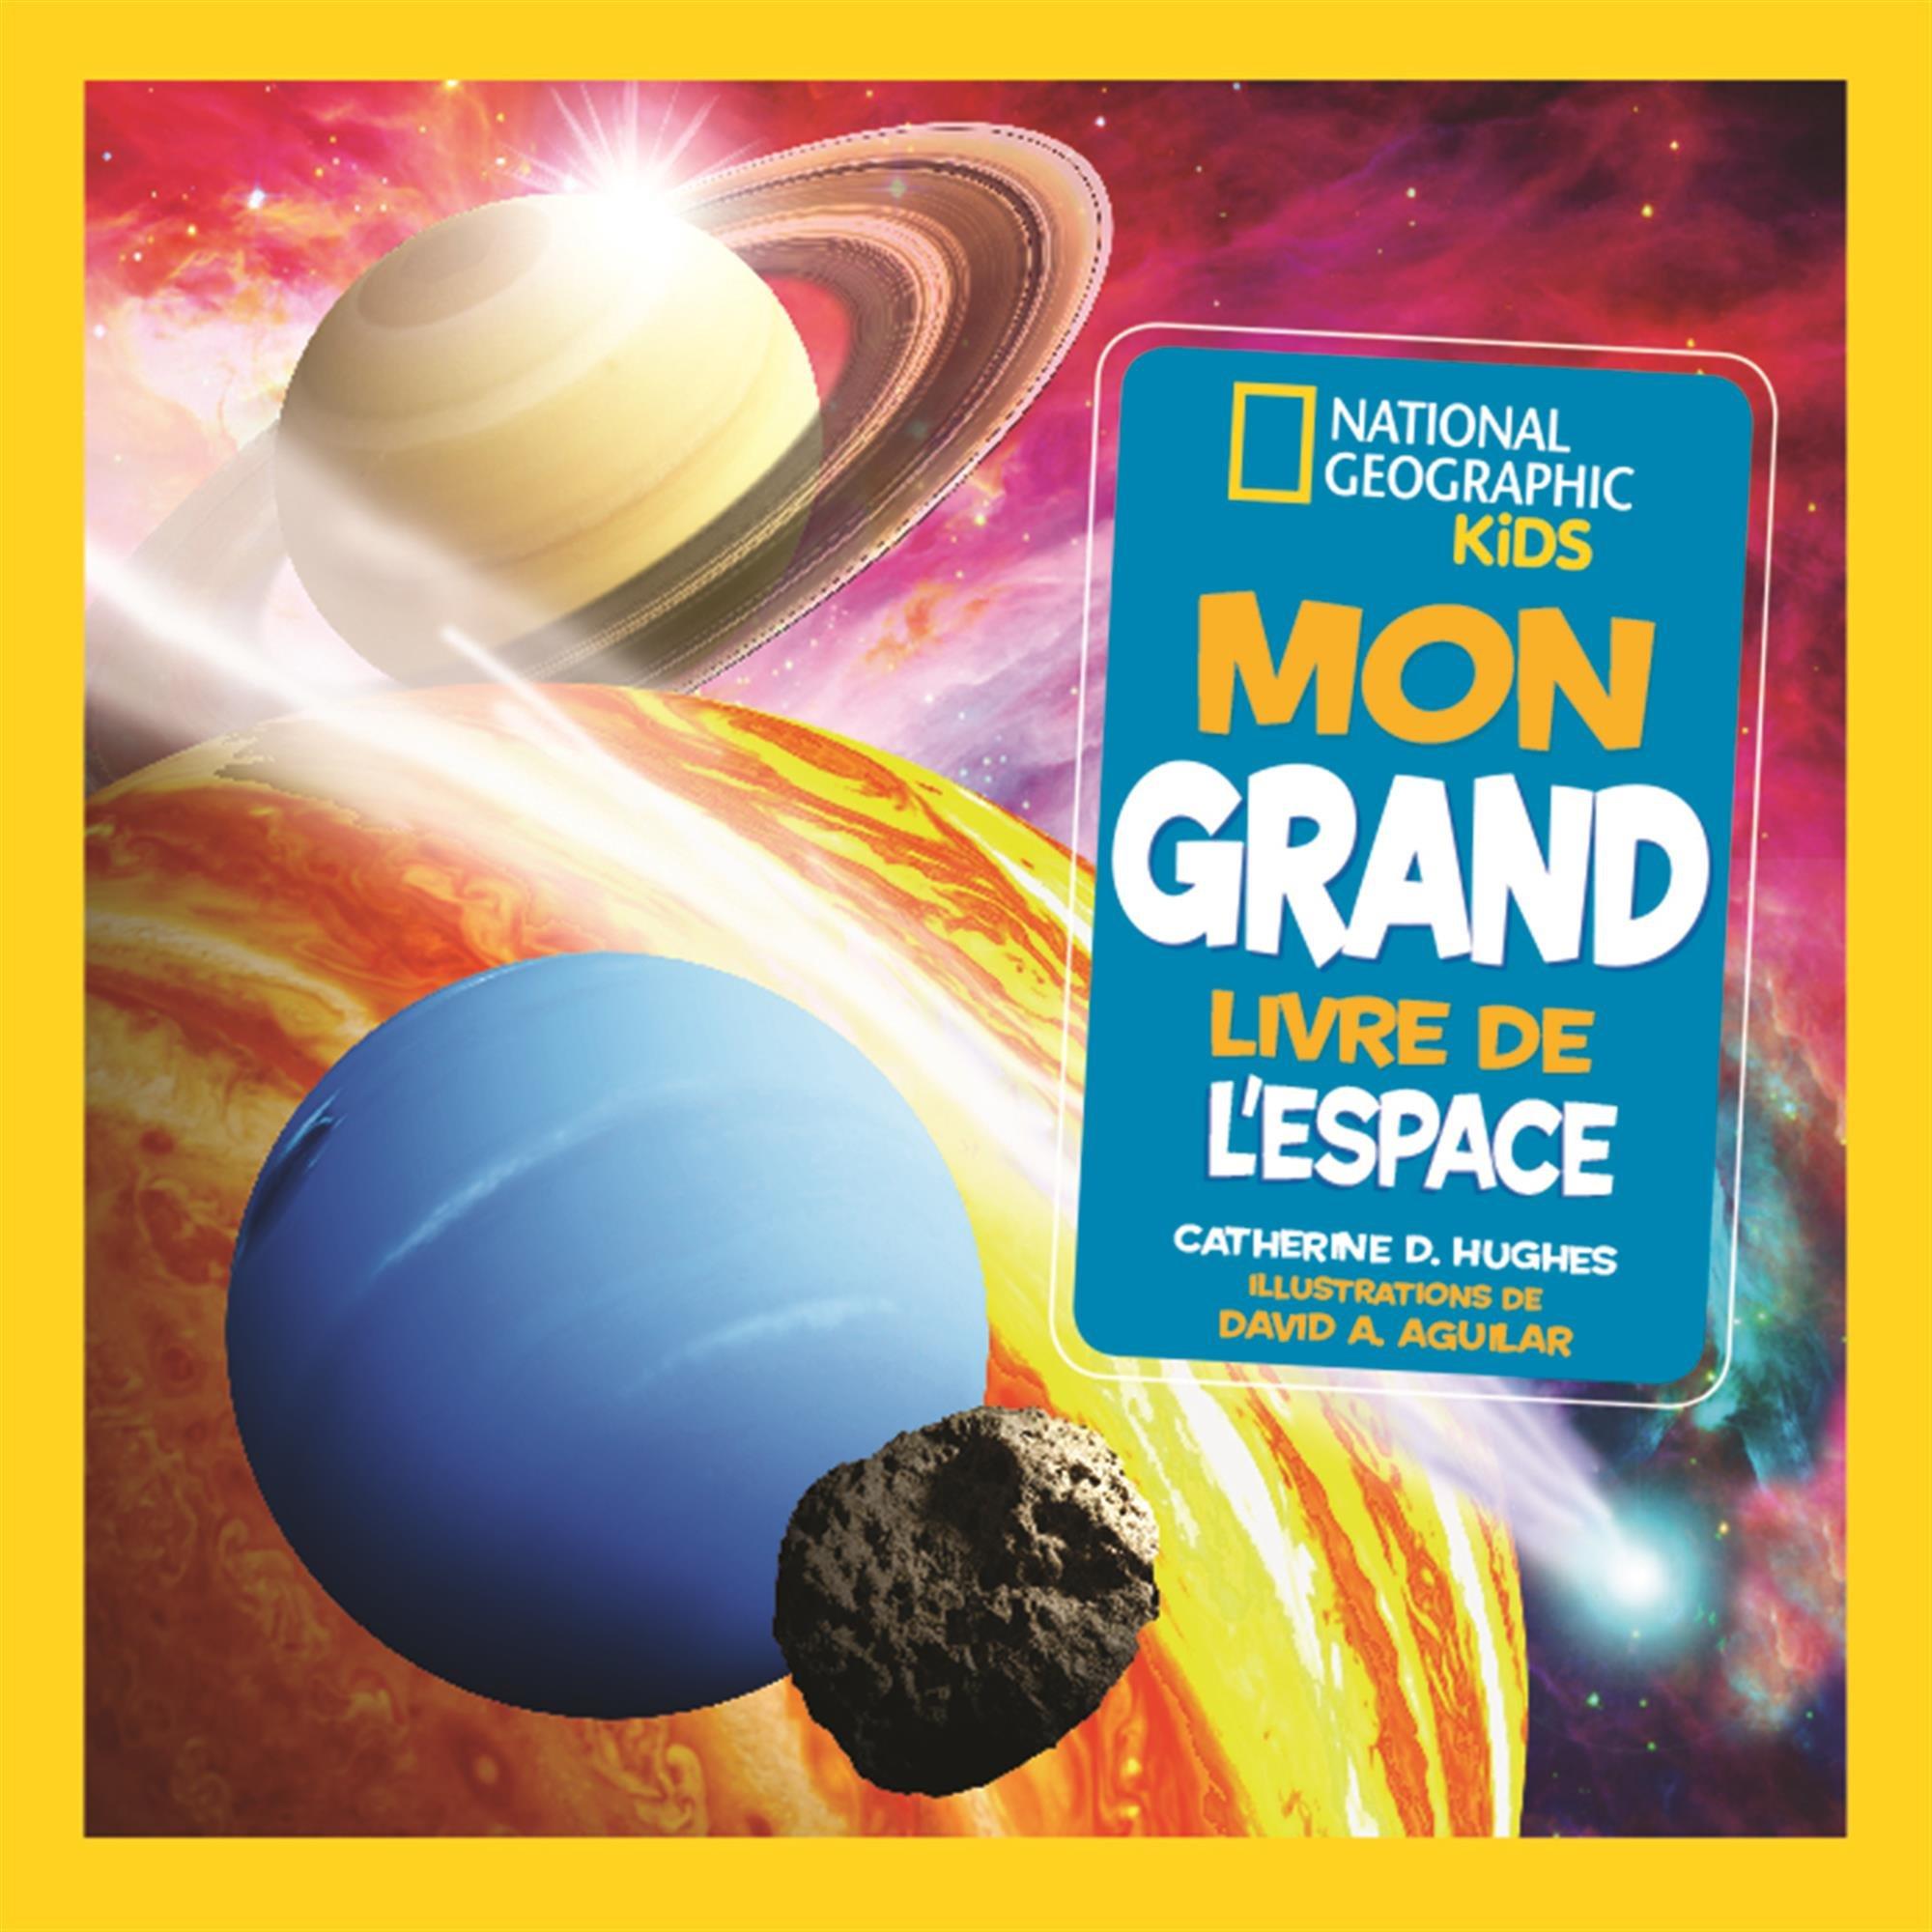 National Geographic Kids: Mon Grand Livre de L'Espace (French Edition)